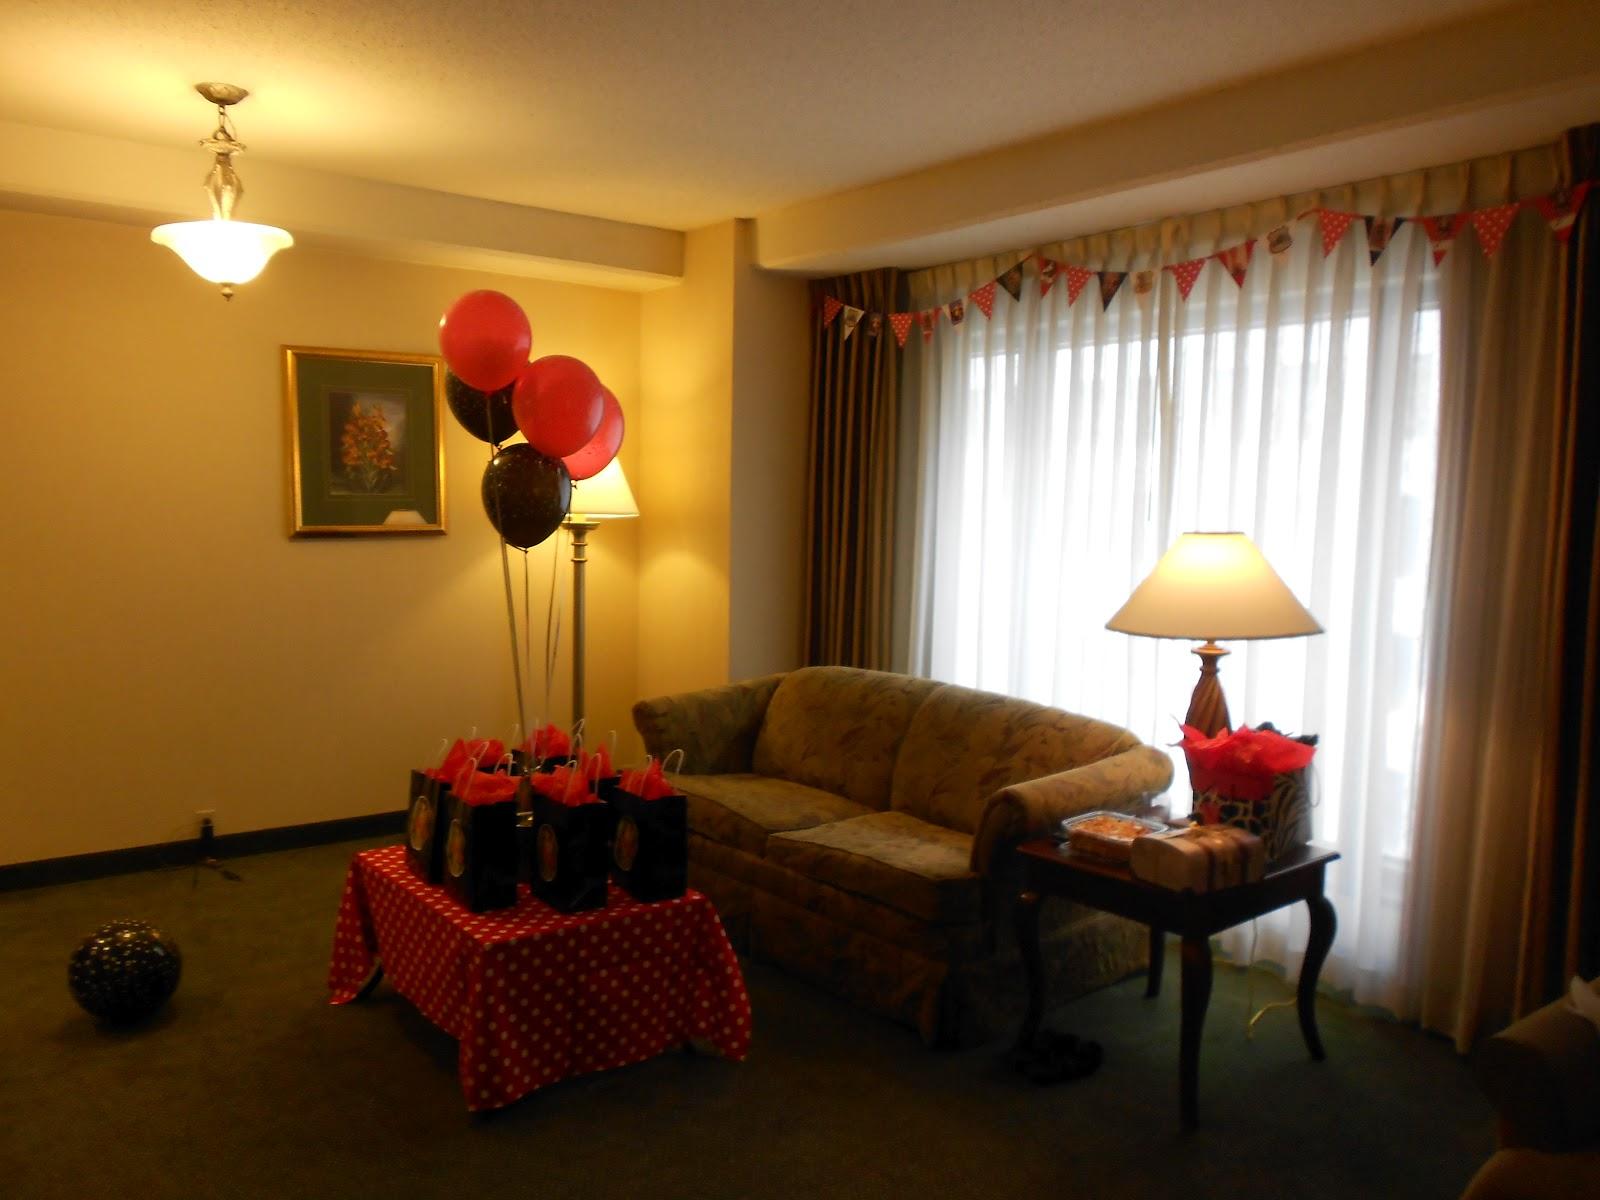 Wedding night hotel room decorations home decorating ideas - Romantic decorations for hotel rooms ...